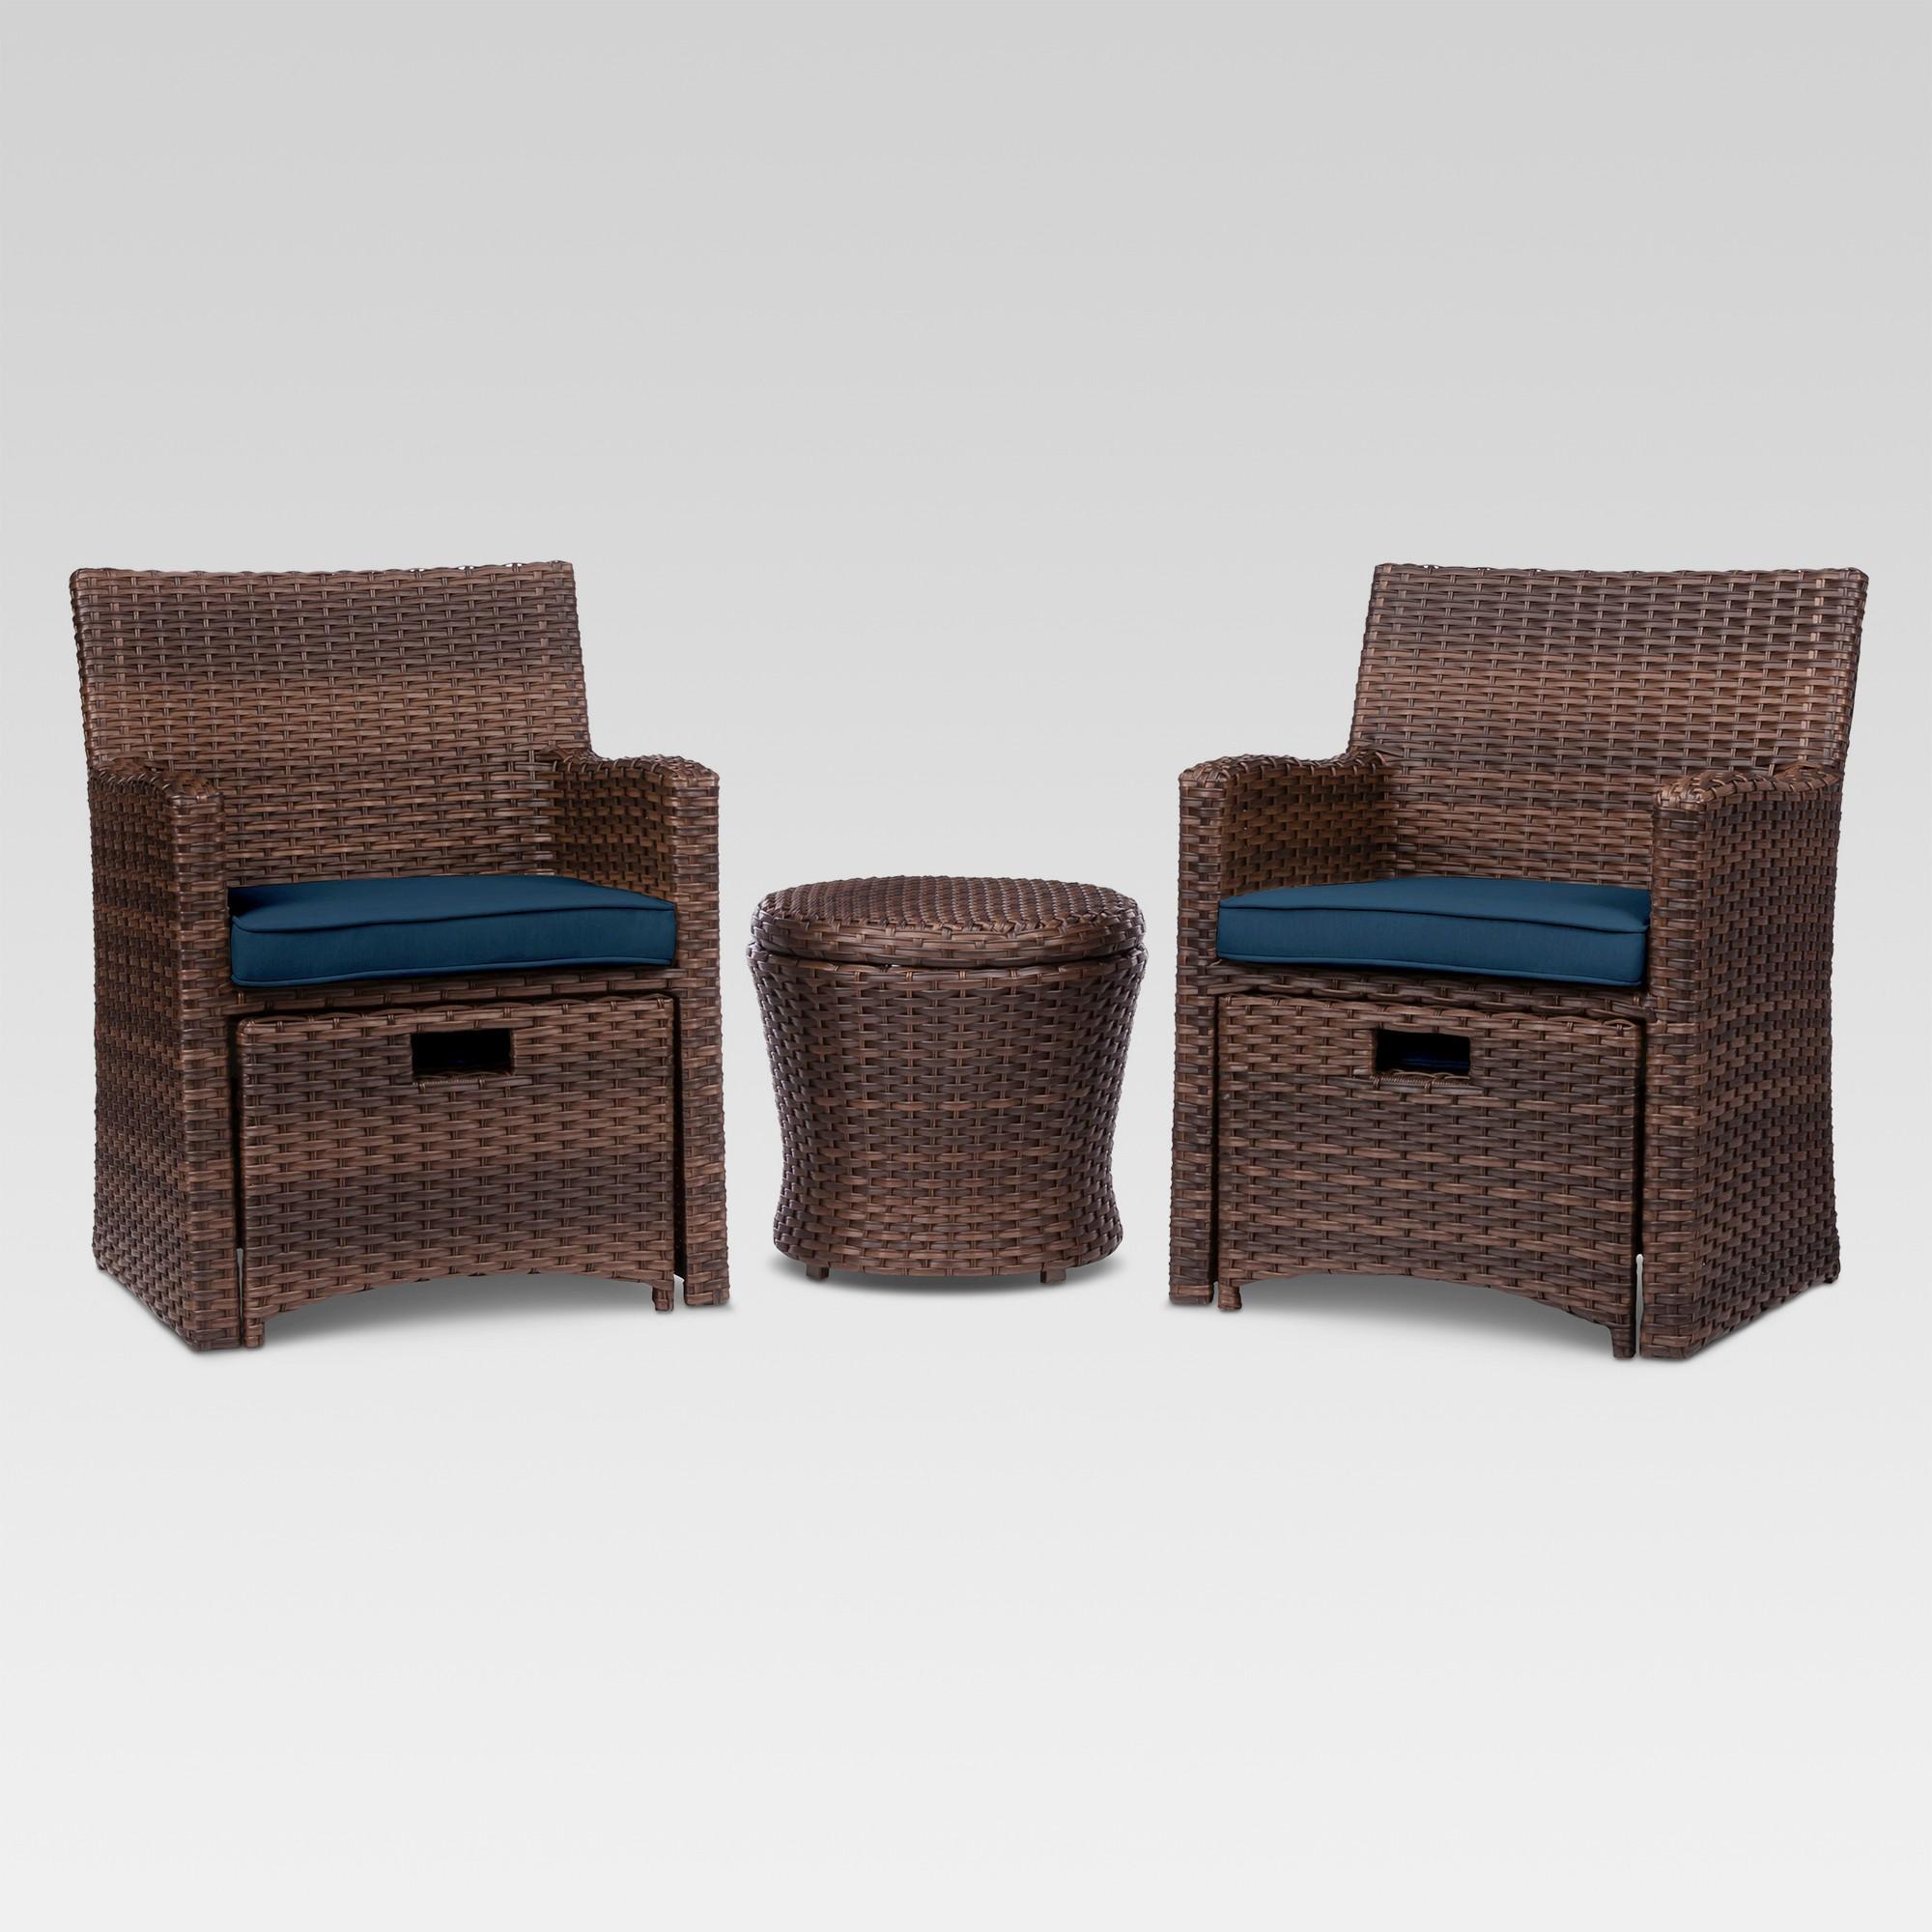 Threshold Wicker Patio Furniture